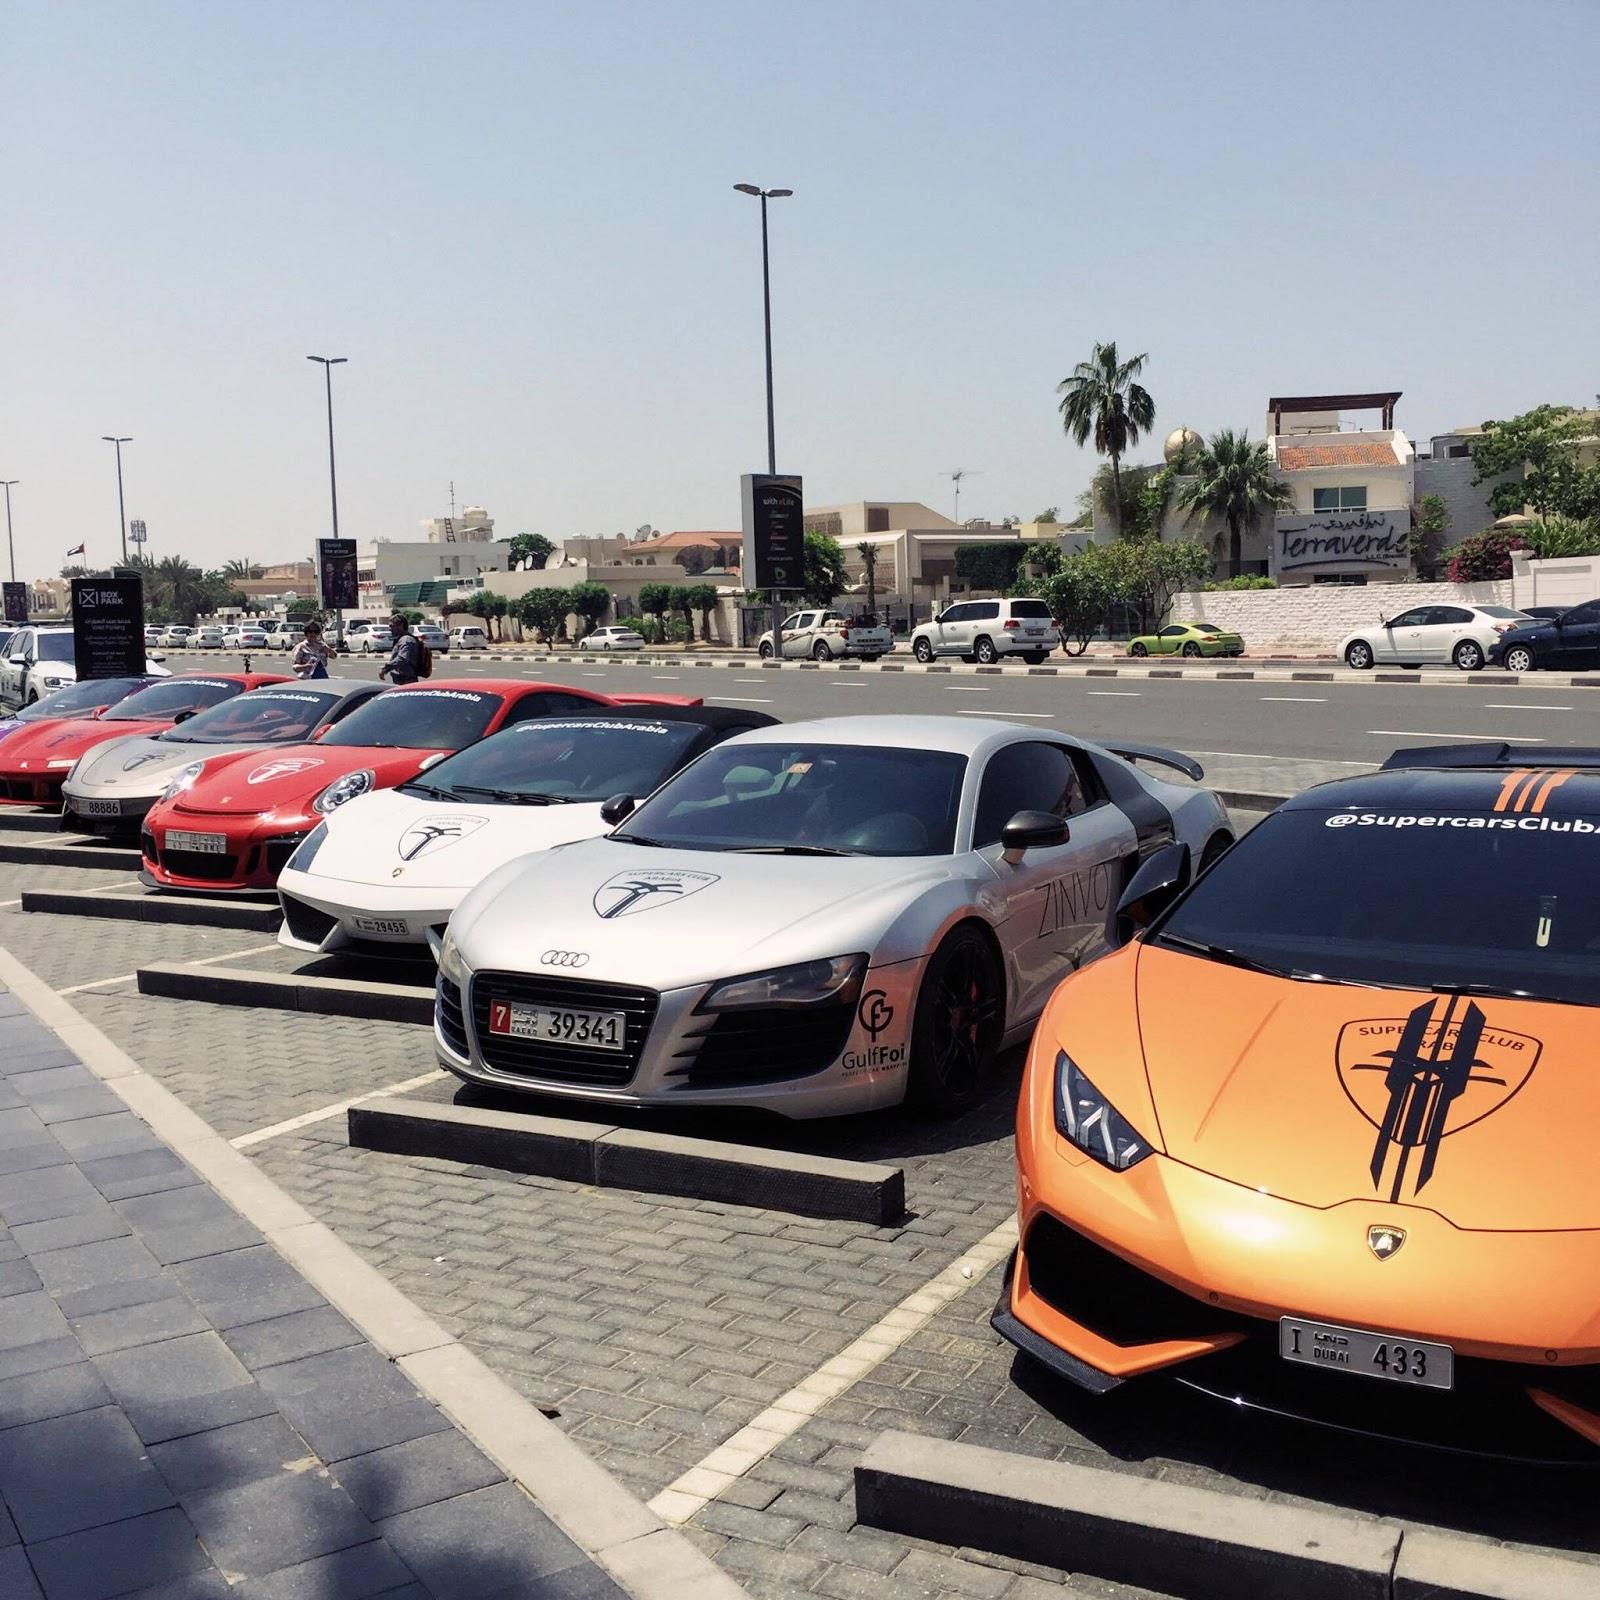 Dubai Desert Blogger: CRAZY SUPERCARS LINE UP IN DUBAI